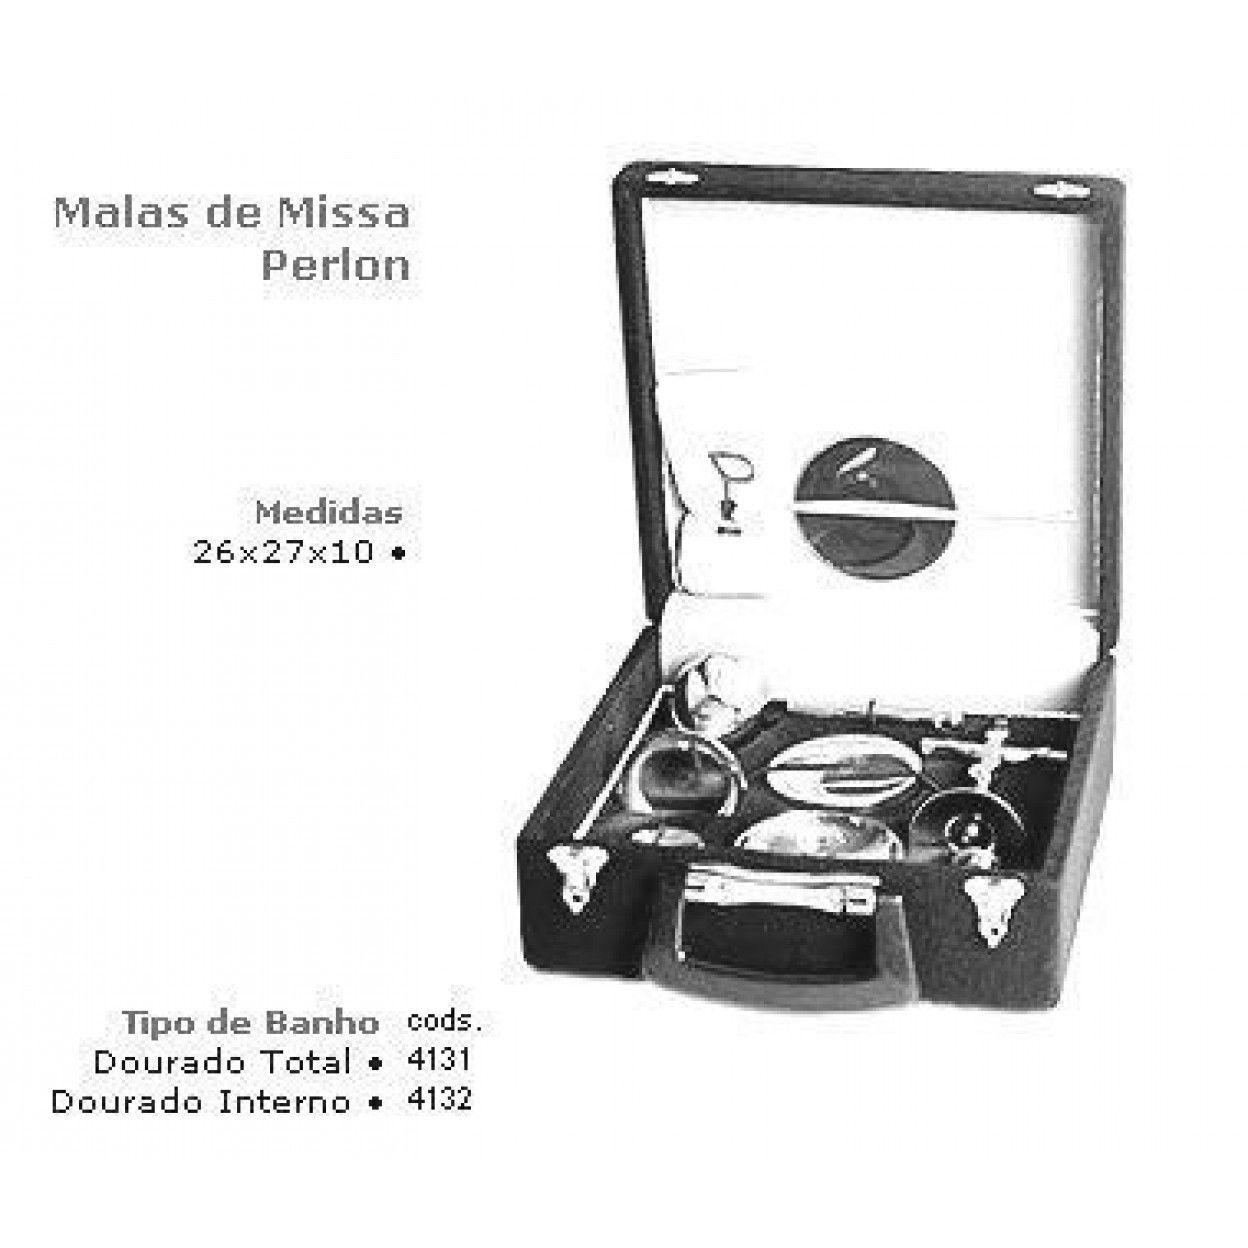 MALA DE MISSA EM PERLON 4132